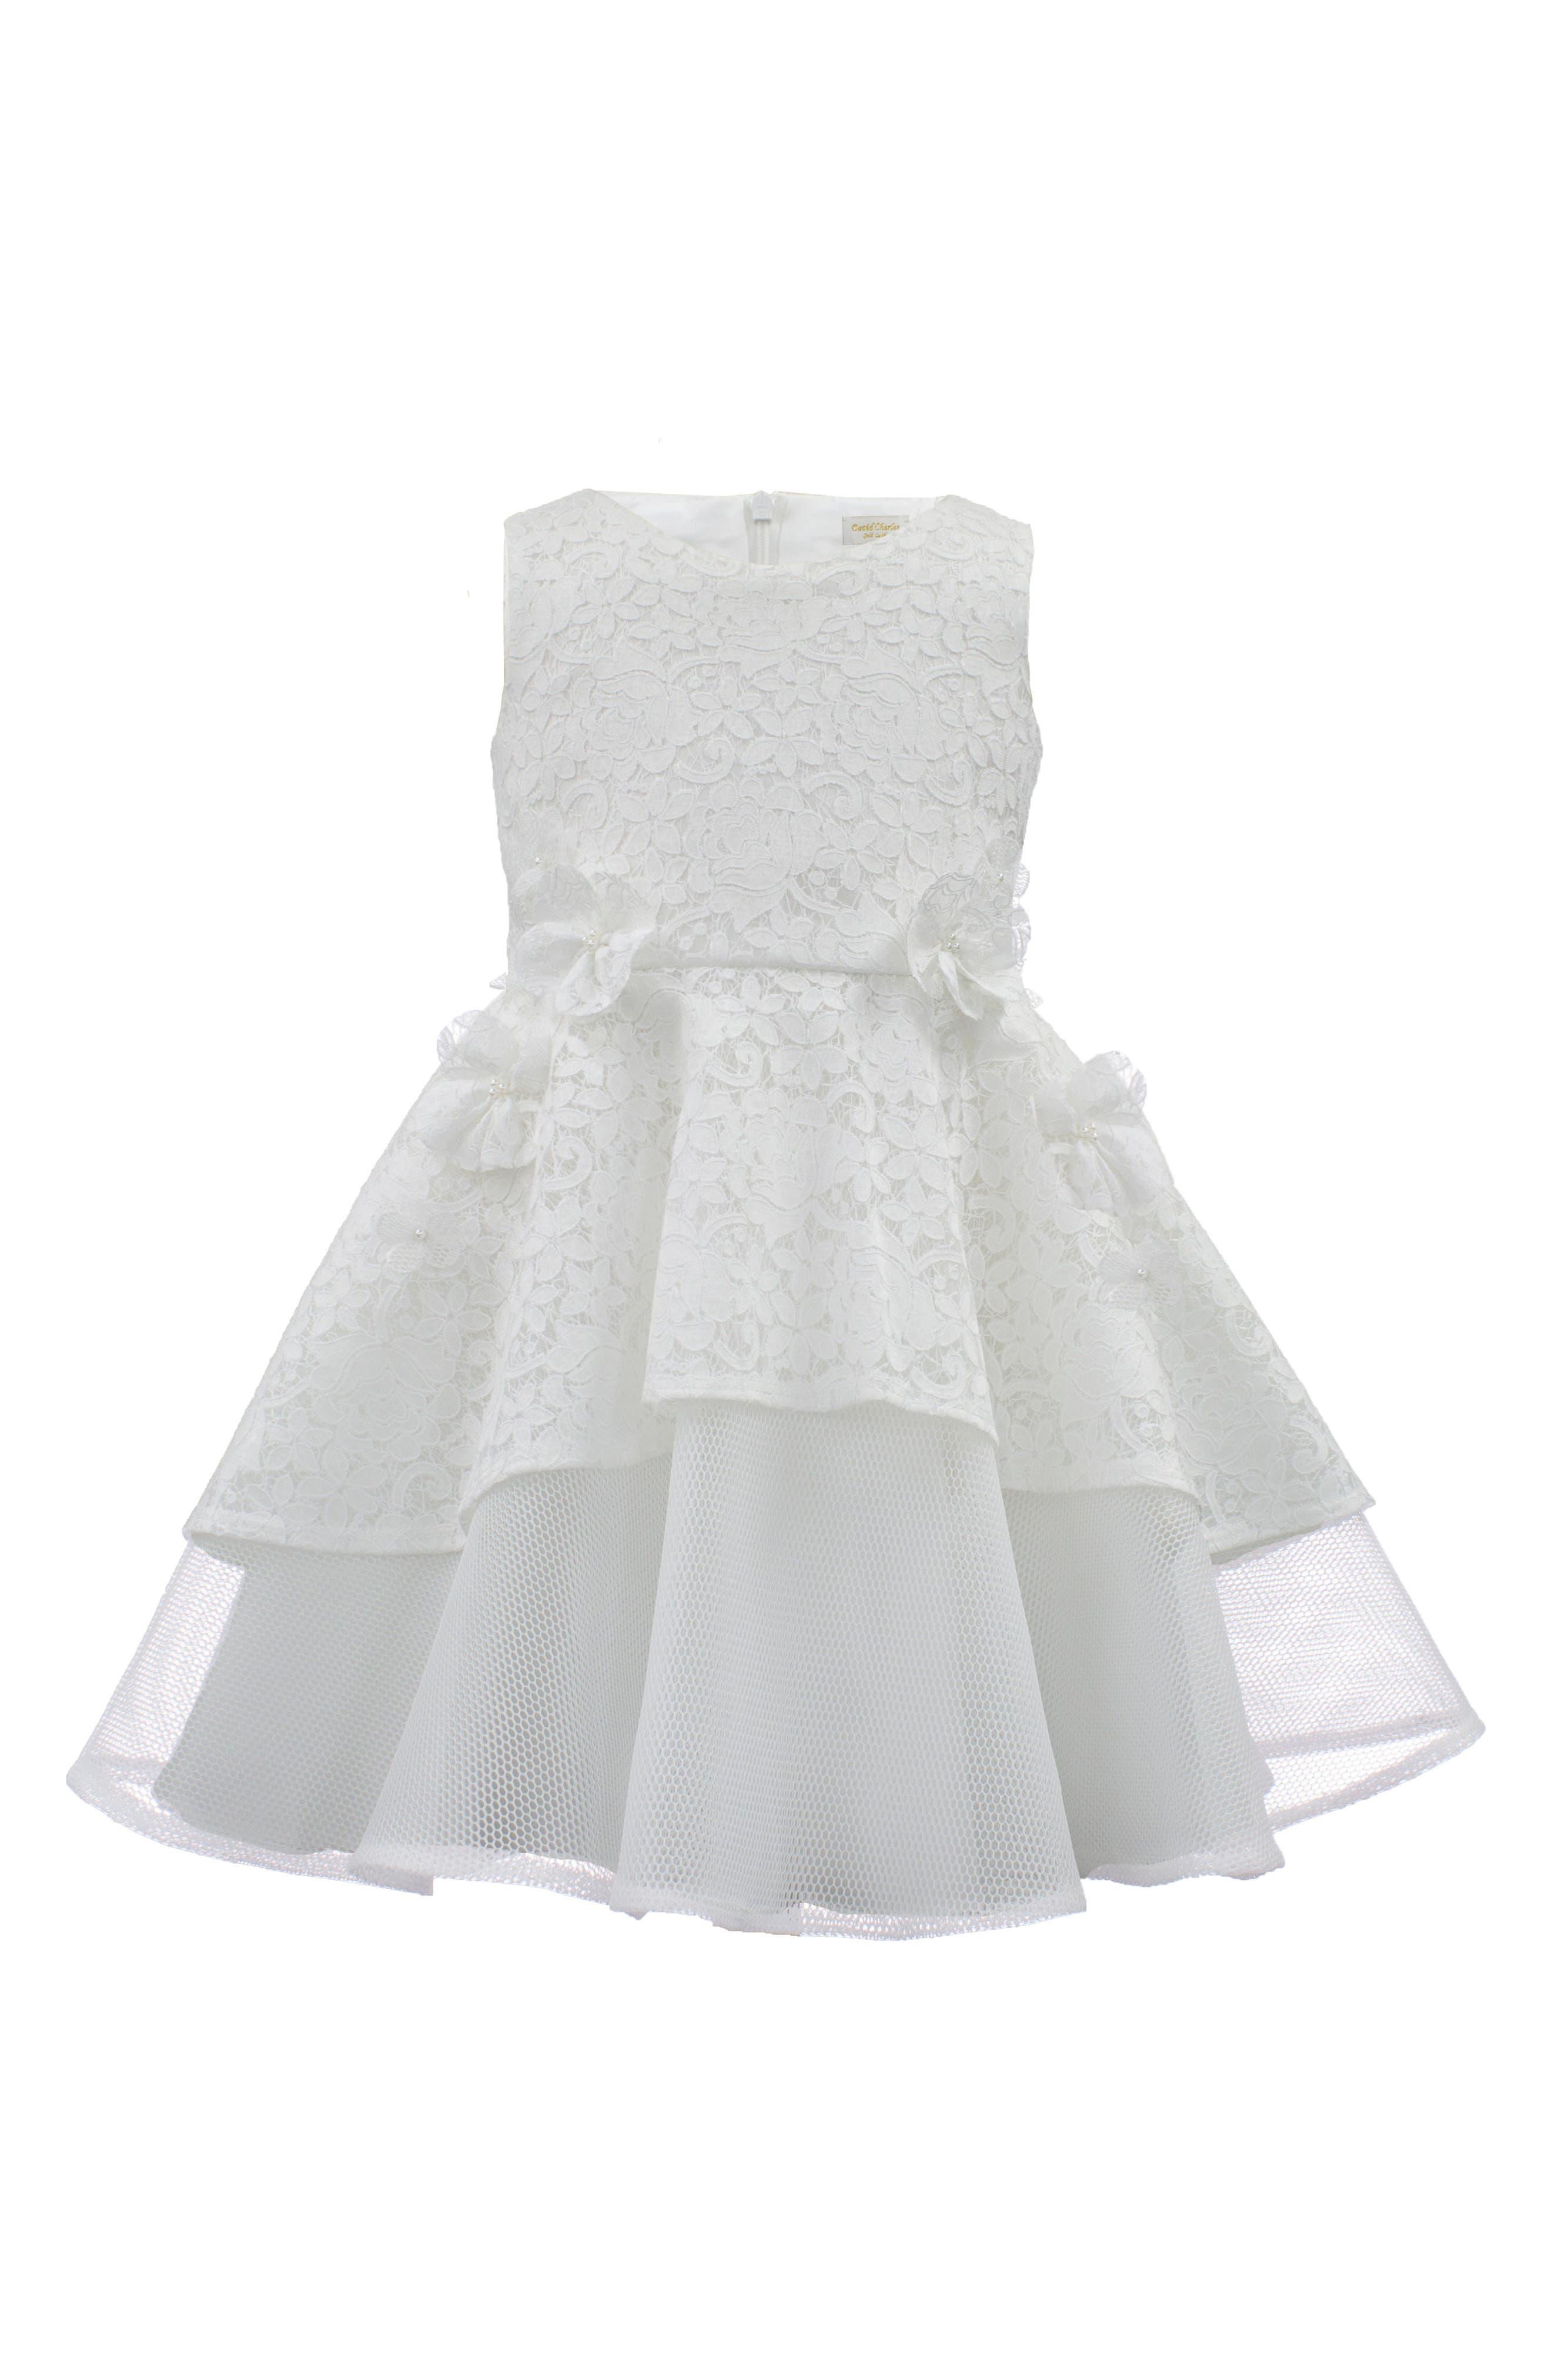 Lace & Techno Mesh Dress,                             Main thumbnail 1, color,                             901